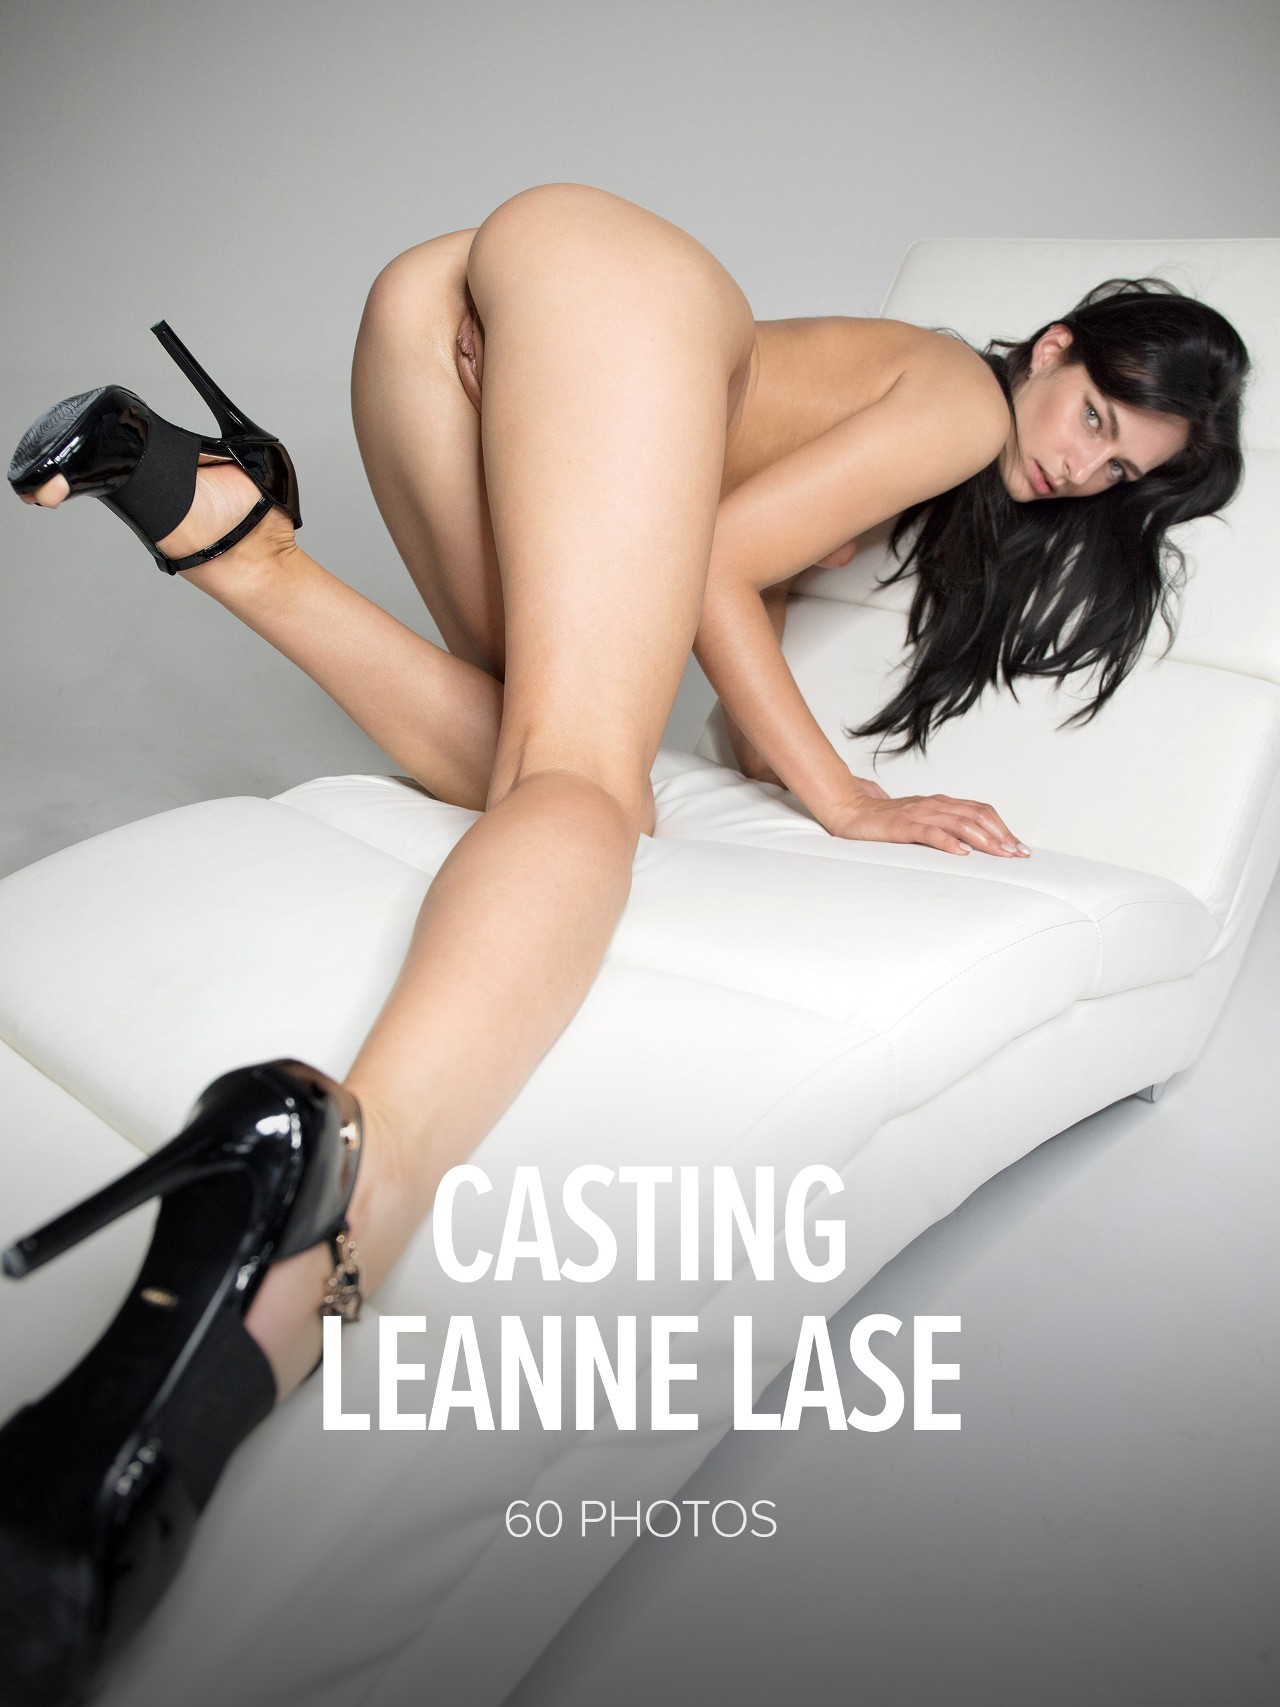 Leanne Lase: CASTING Leanne Lase